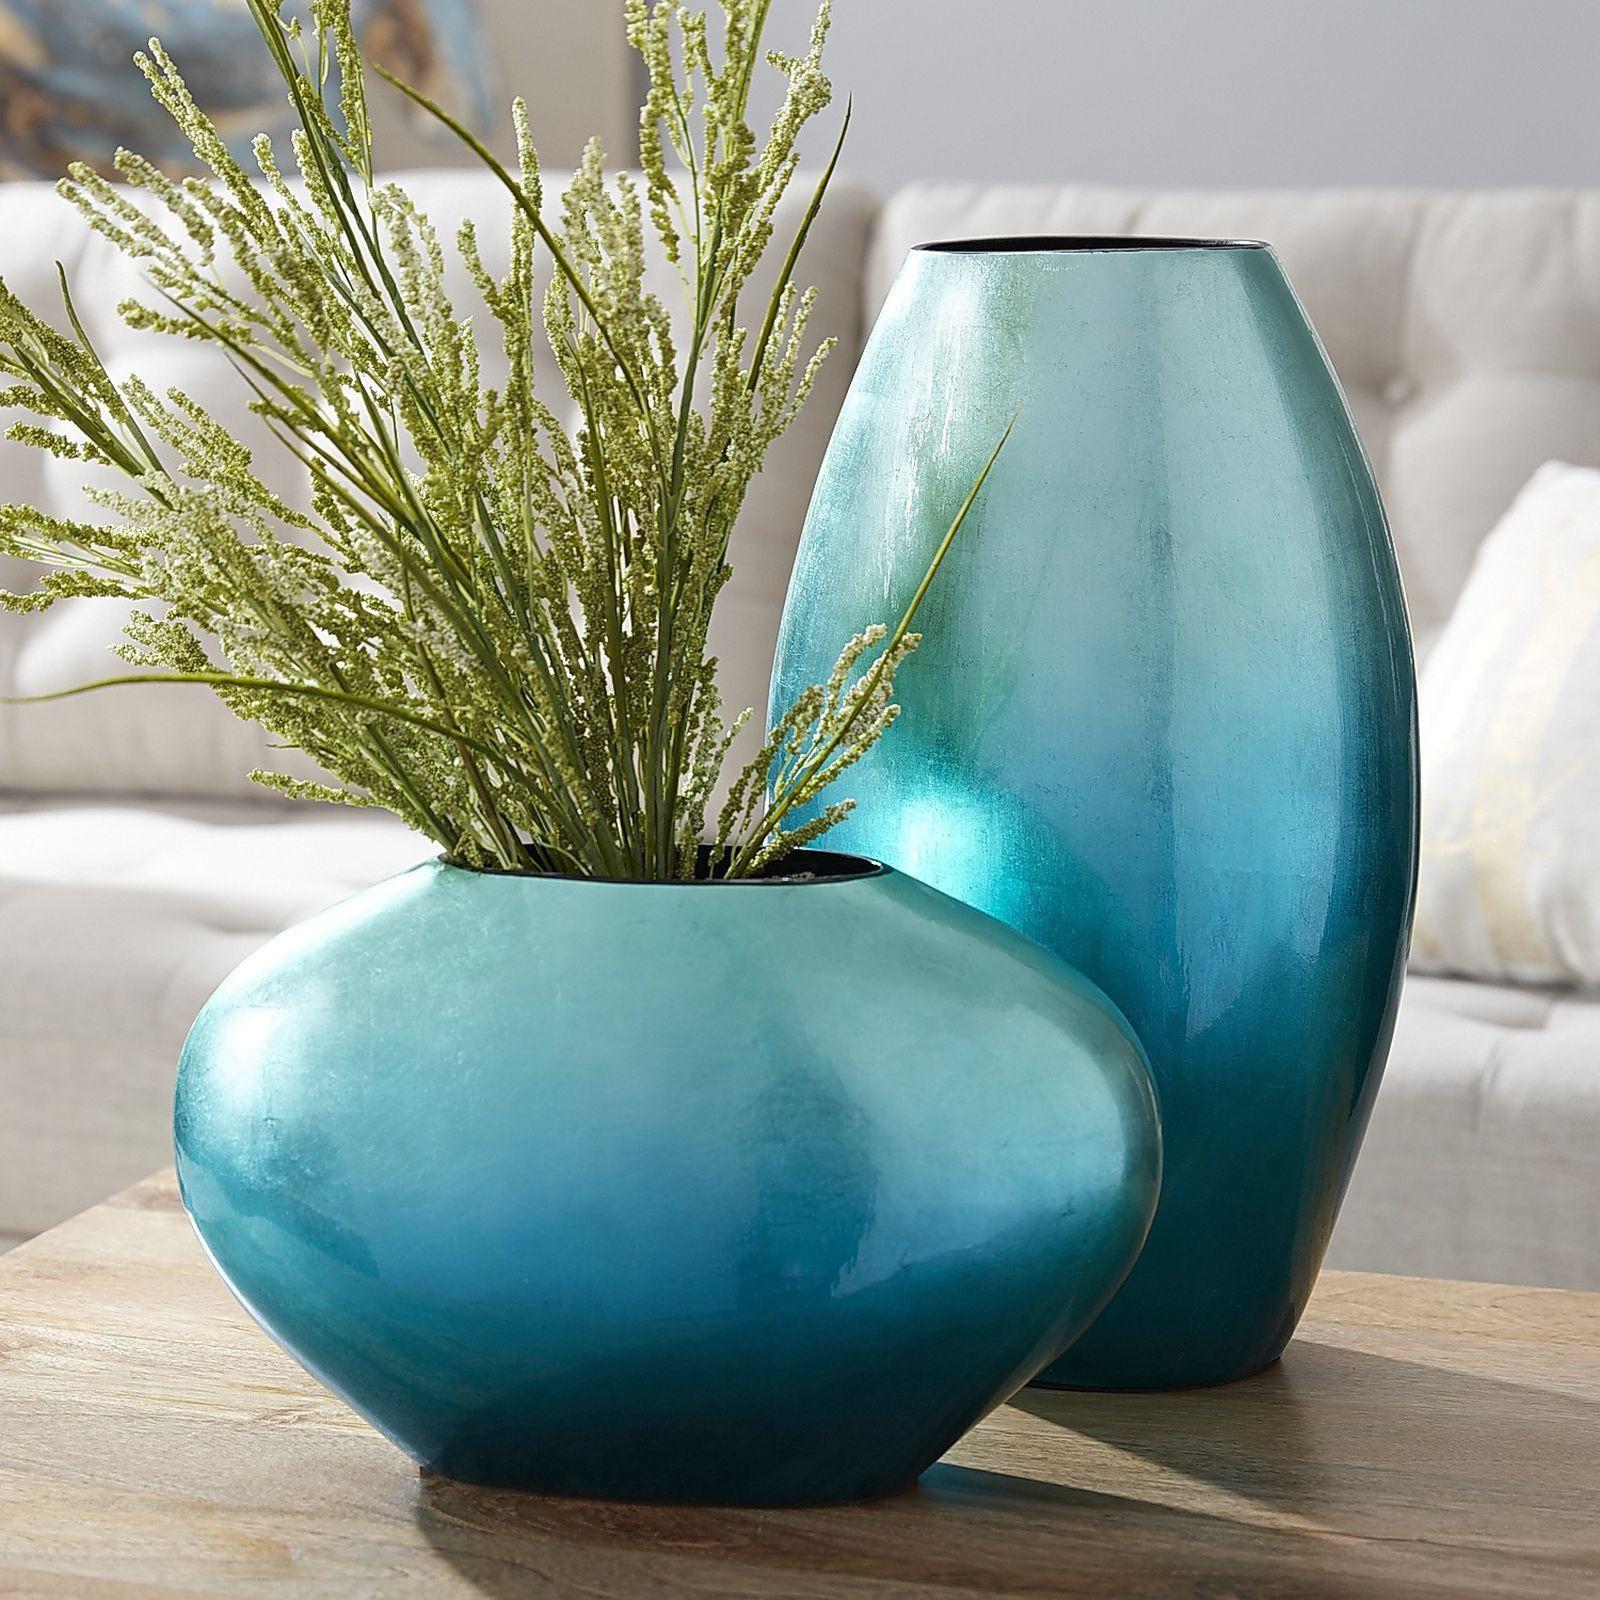 light blue glass vase of 37 fenton blue glass vase the weekly world pertaining to 37 fenton blue glass vase